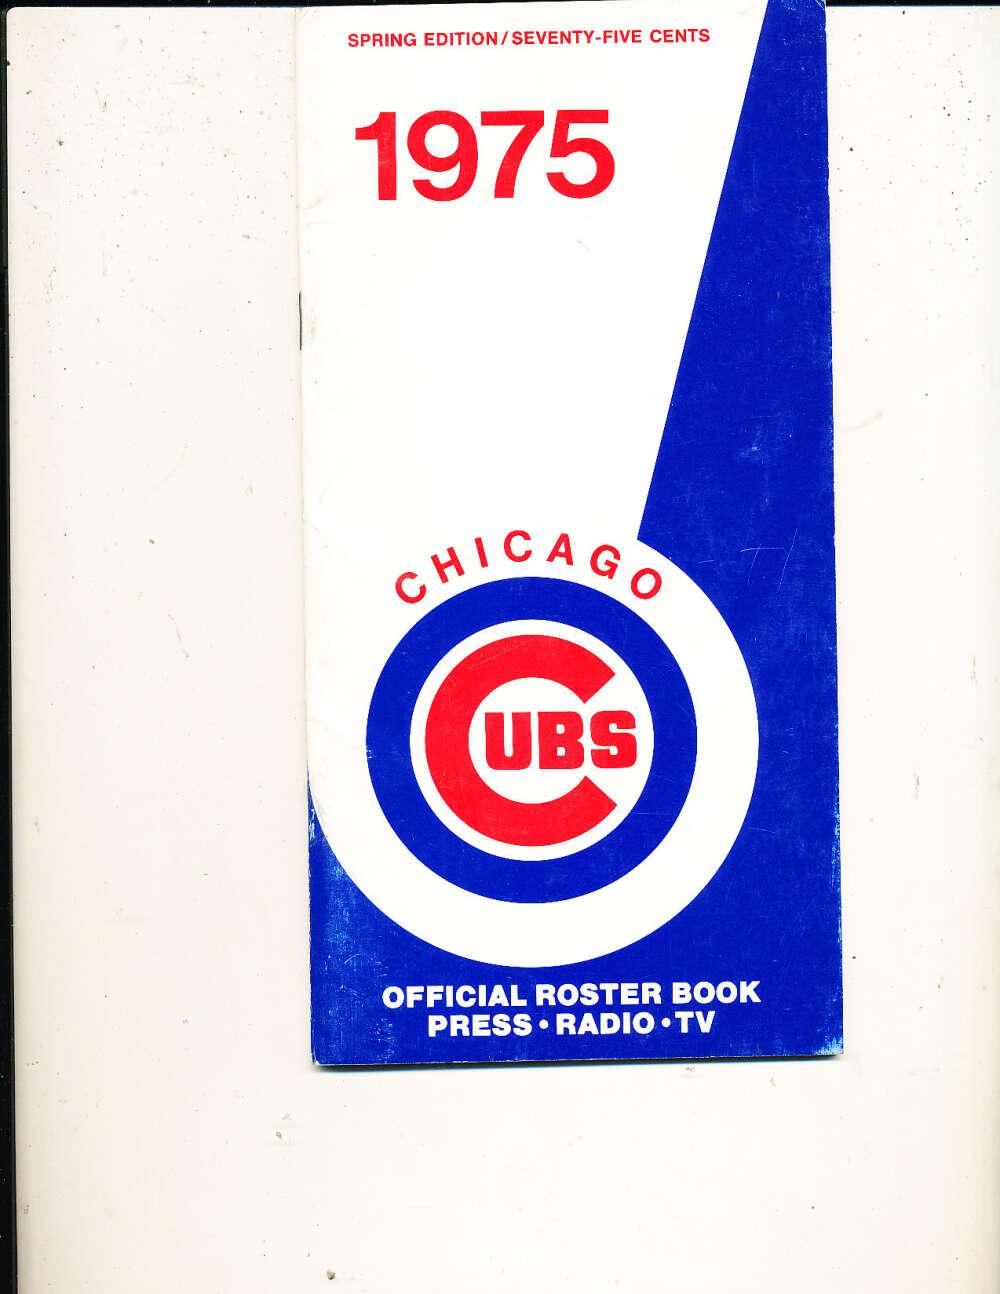 1975 Chicago Cubs Spring Baseball Media Guide